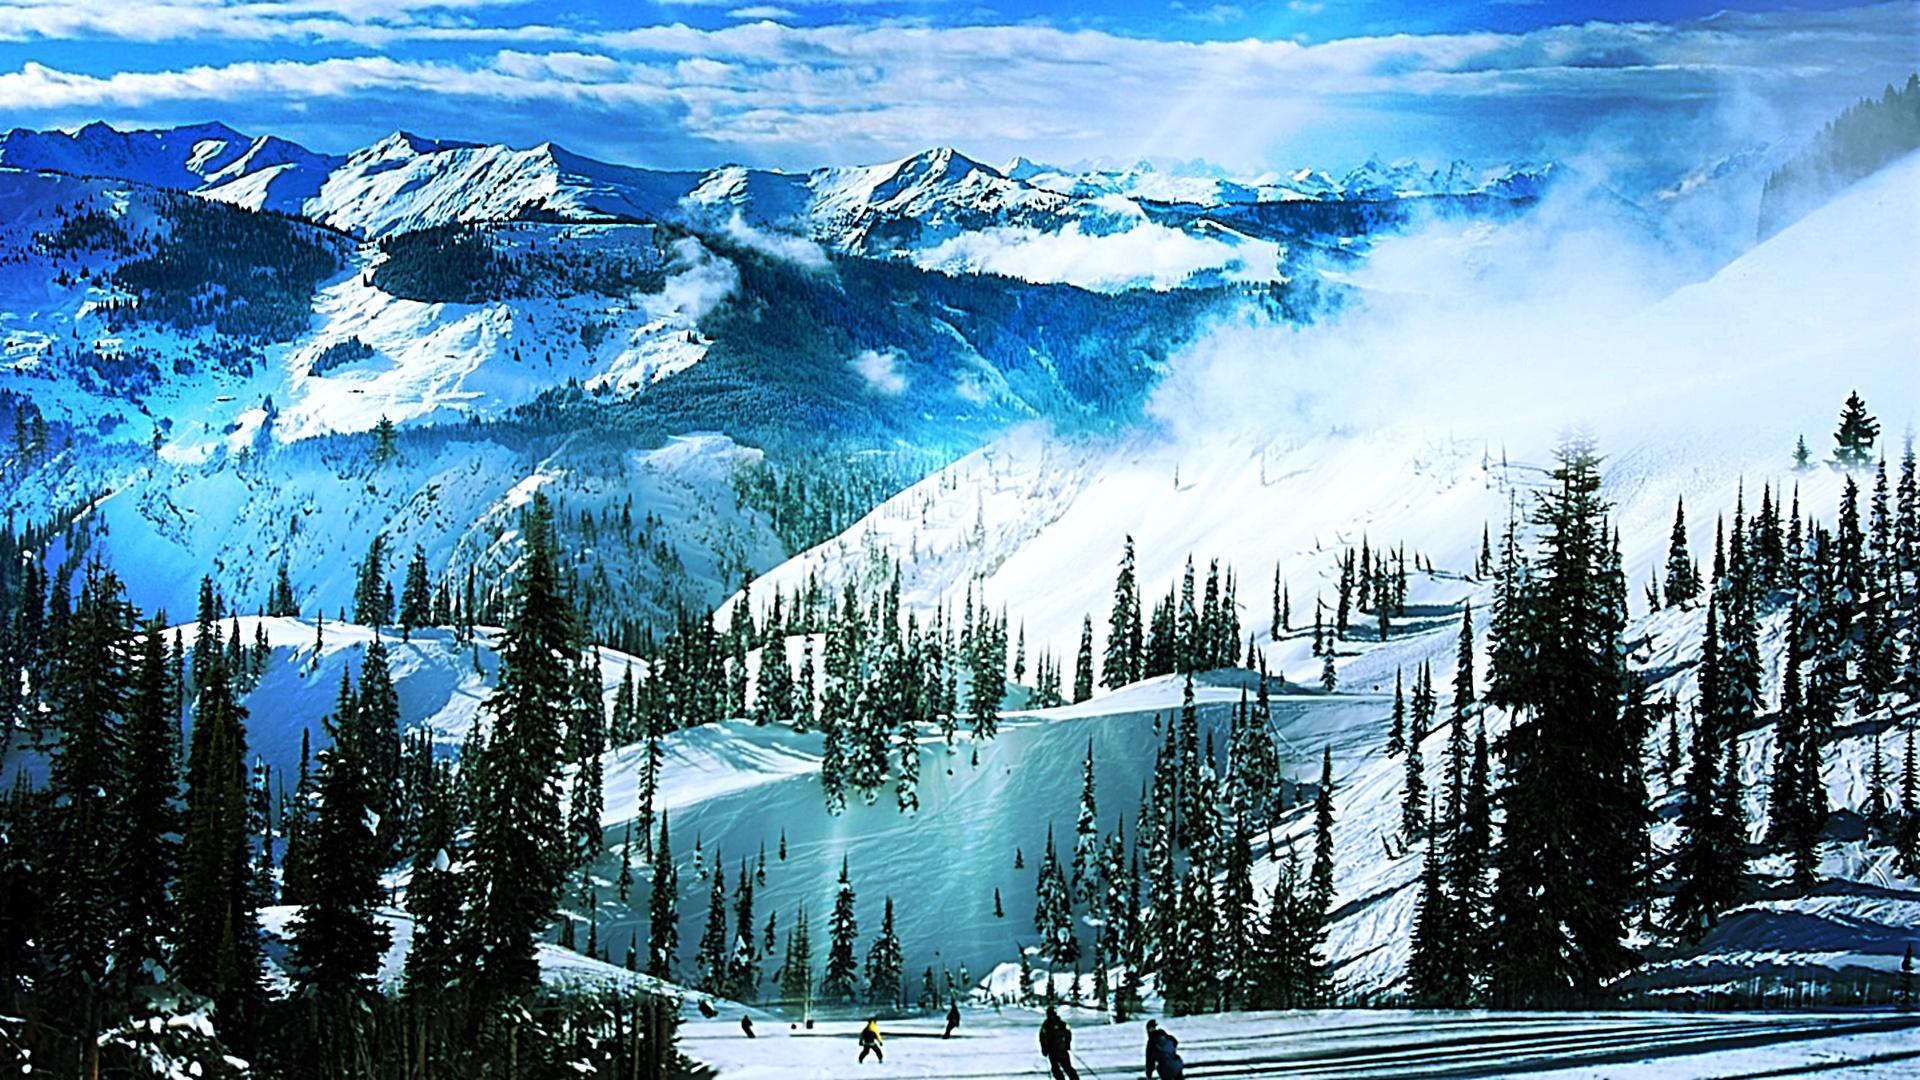 Ski Wallpaper 1920x1080